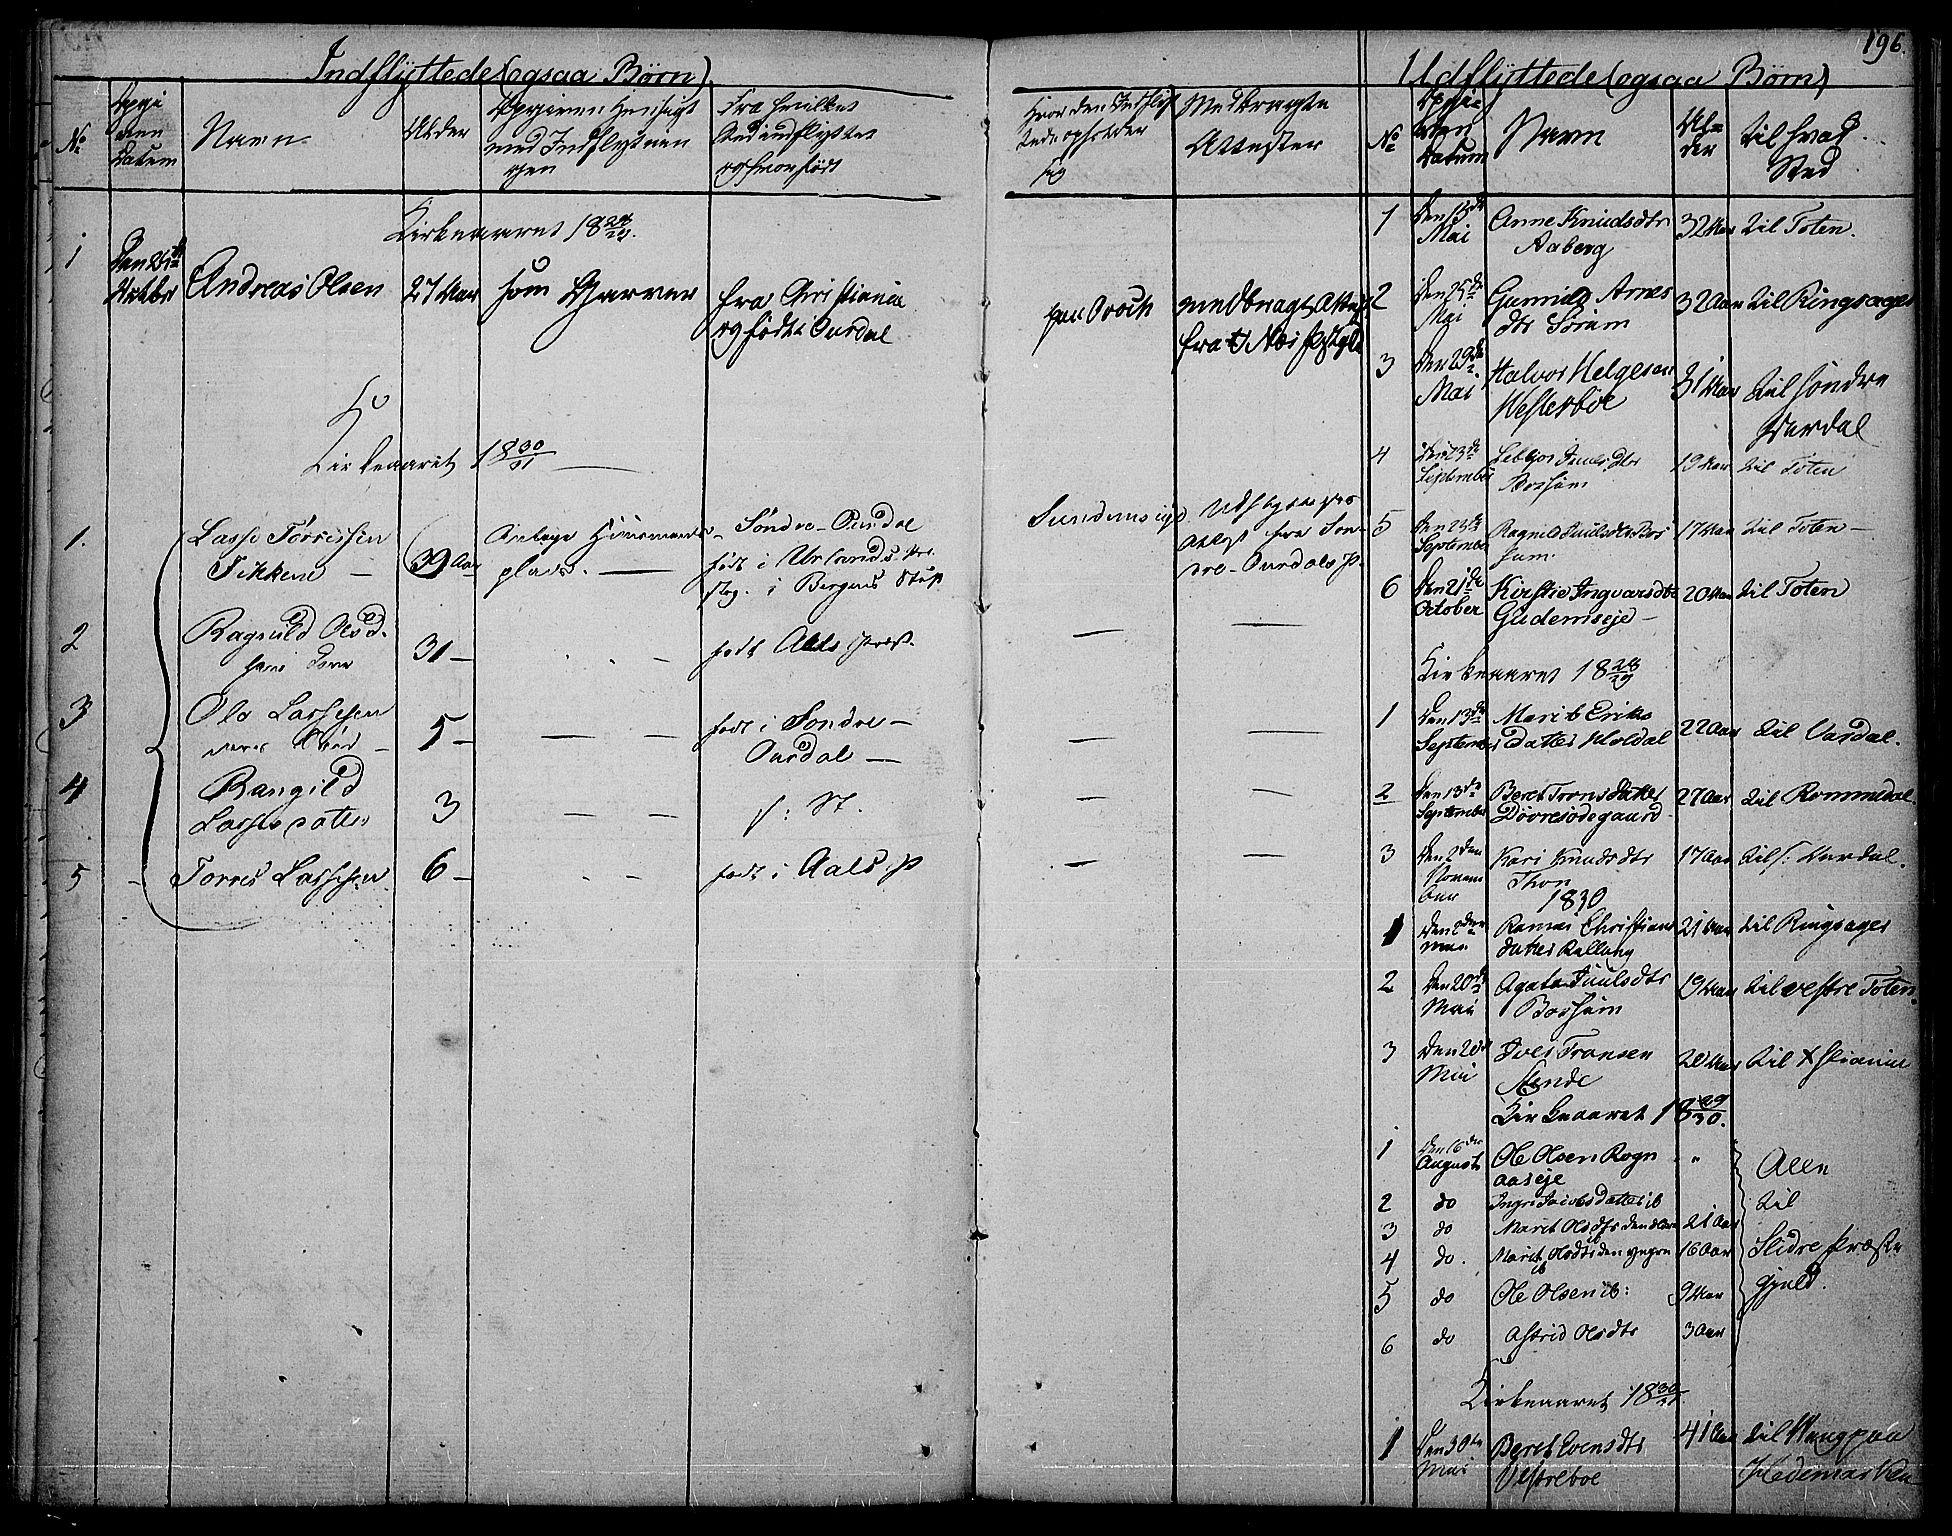 SAH, Nord-Aurdal prestekontor, Ministerialbok nr. 3, 1828-1841, s. 196